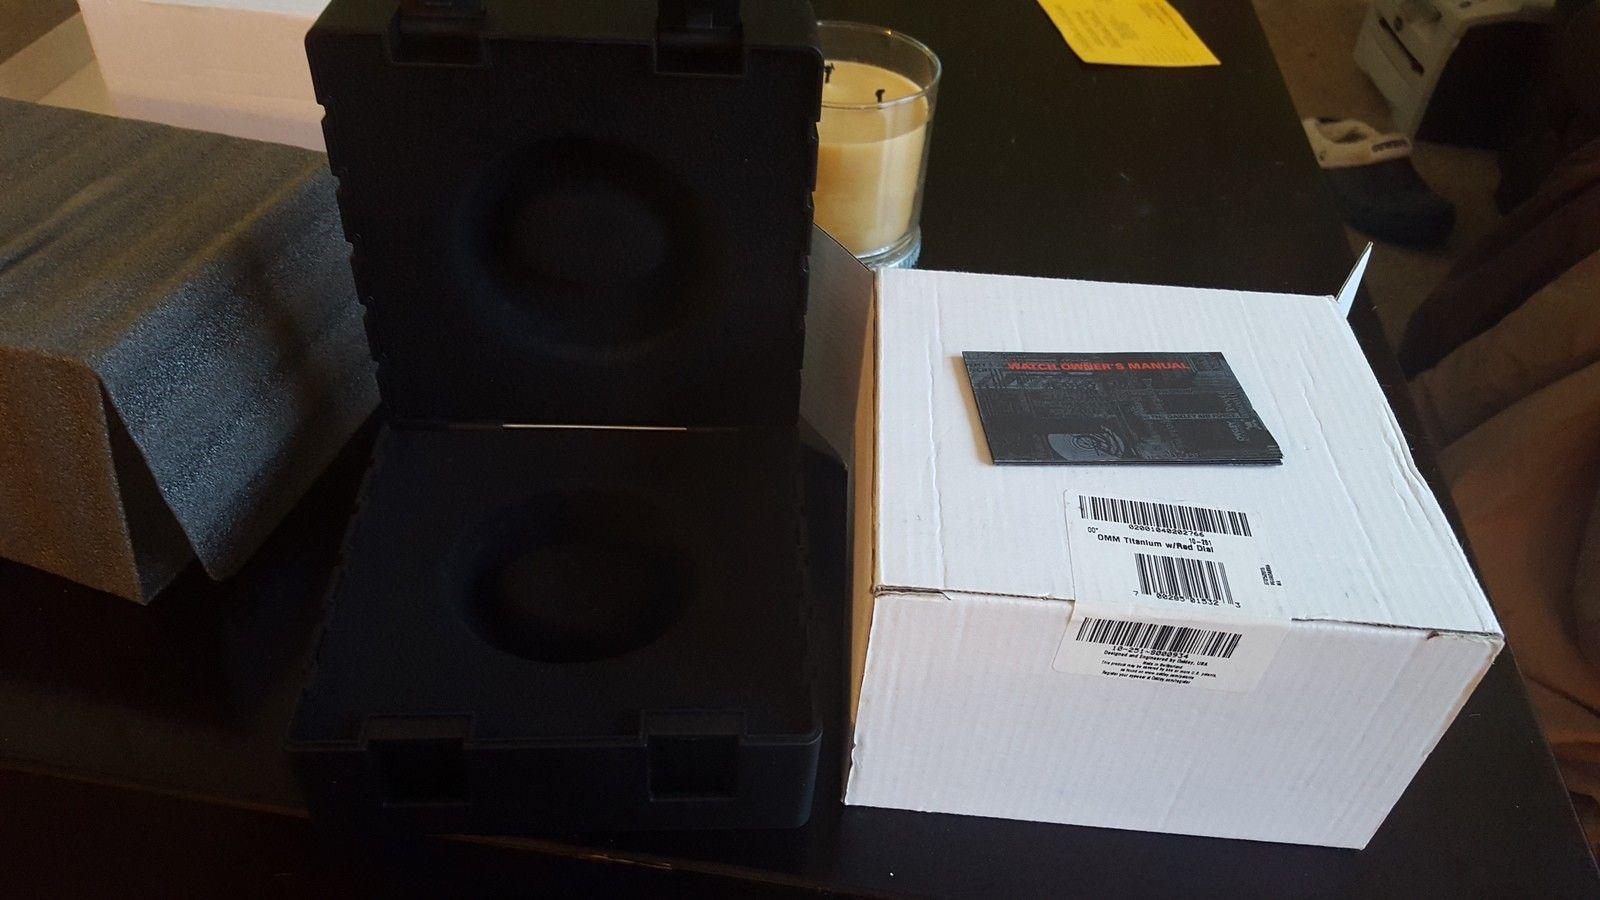 Oakley Watch box - uploadfromtaptalk1448316833027.jpg